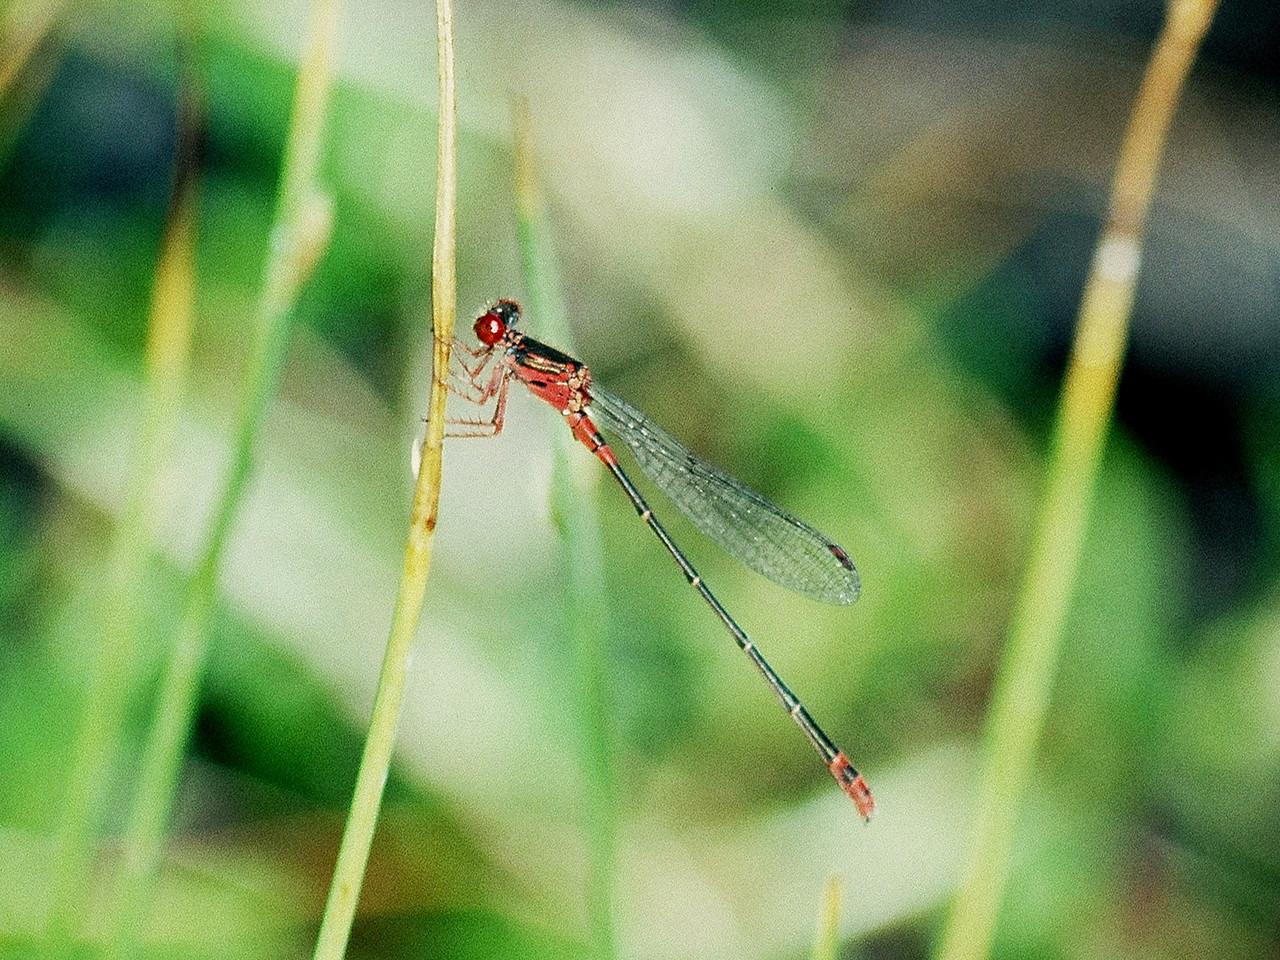 Megalagrion xanthomeles (Odonata: Coenagrionidae), East Maui